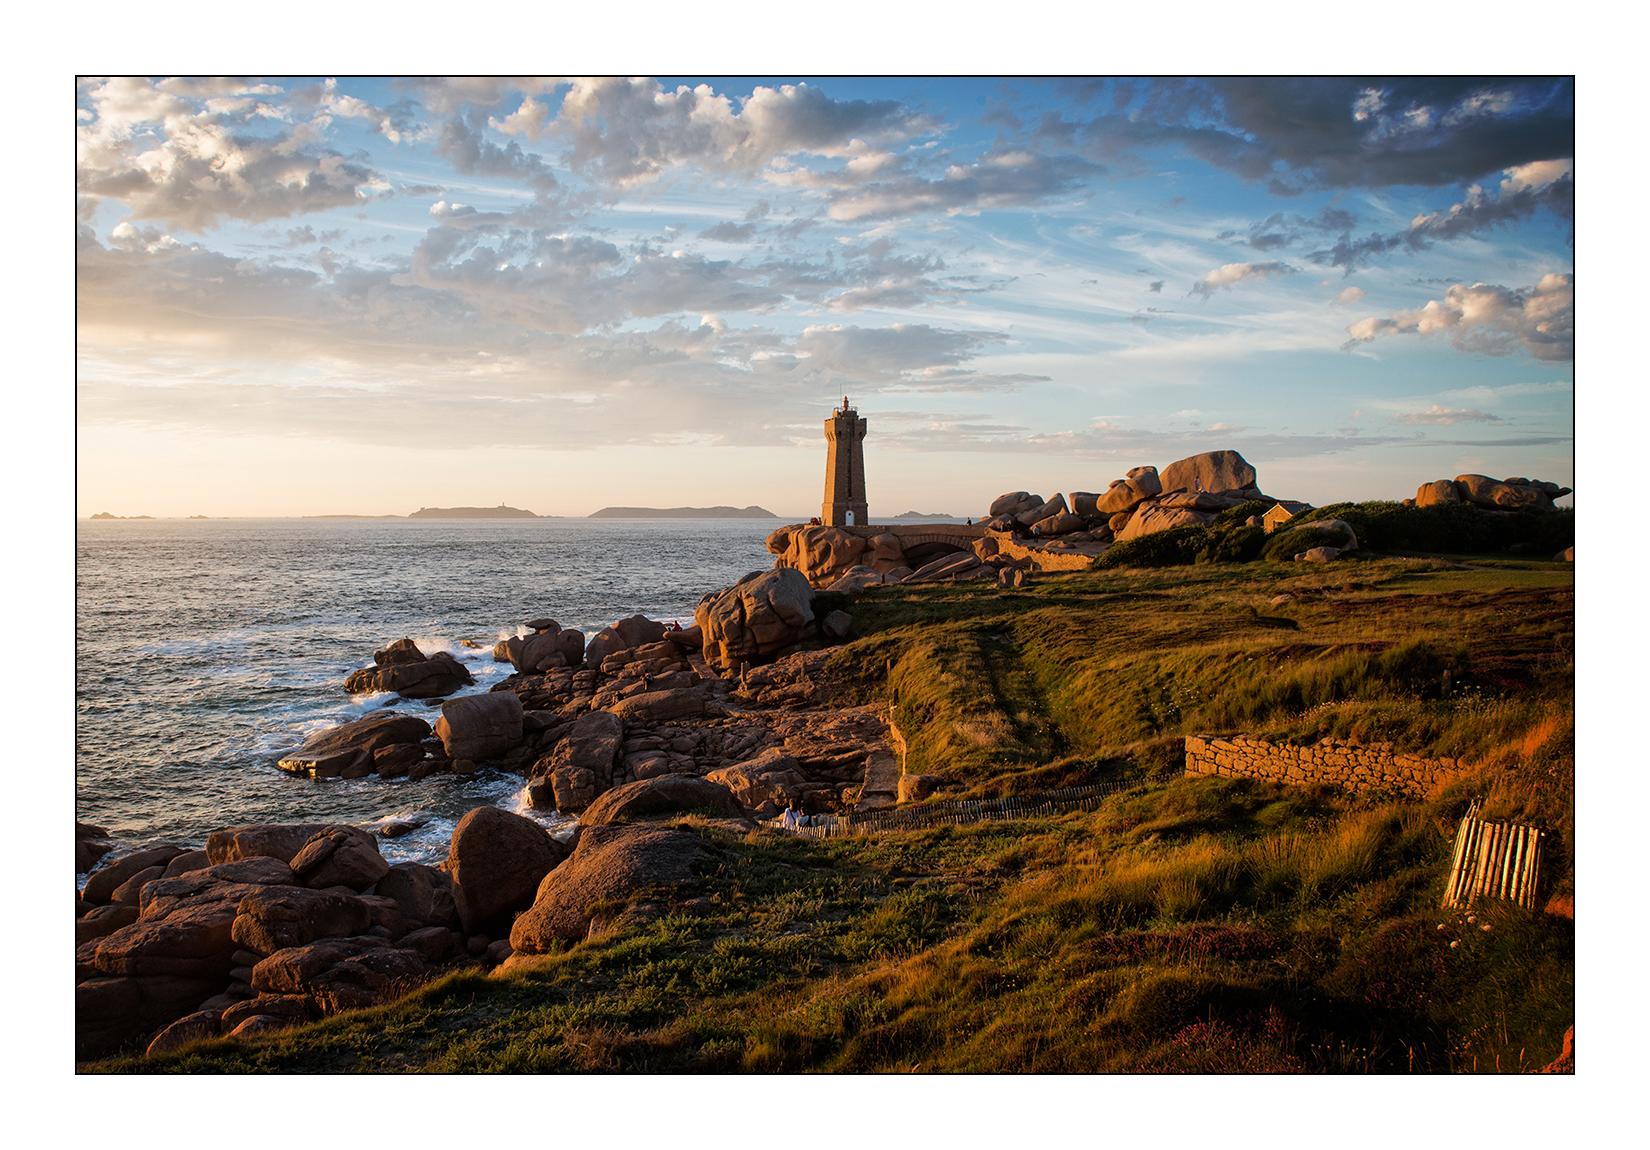 phare-bretagne-illustration-ploumanach-coucher-soleil